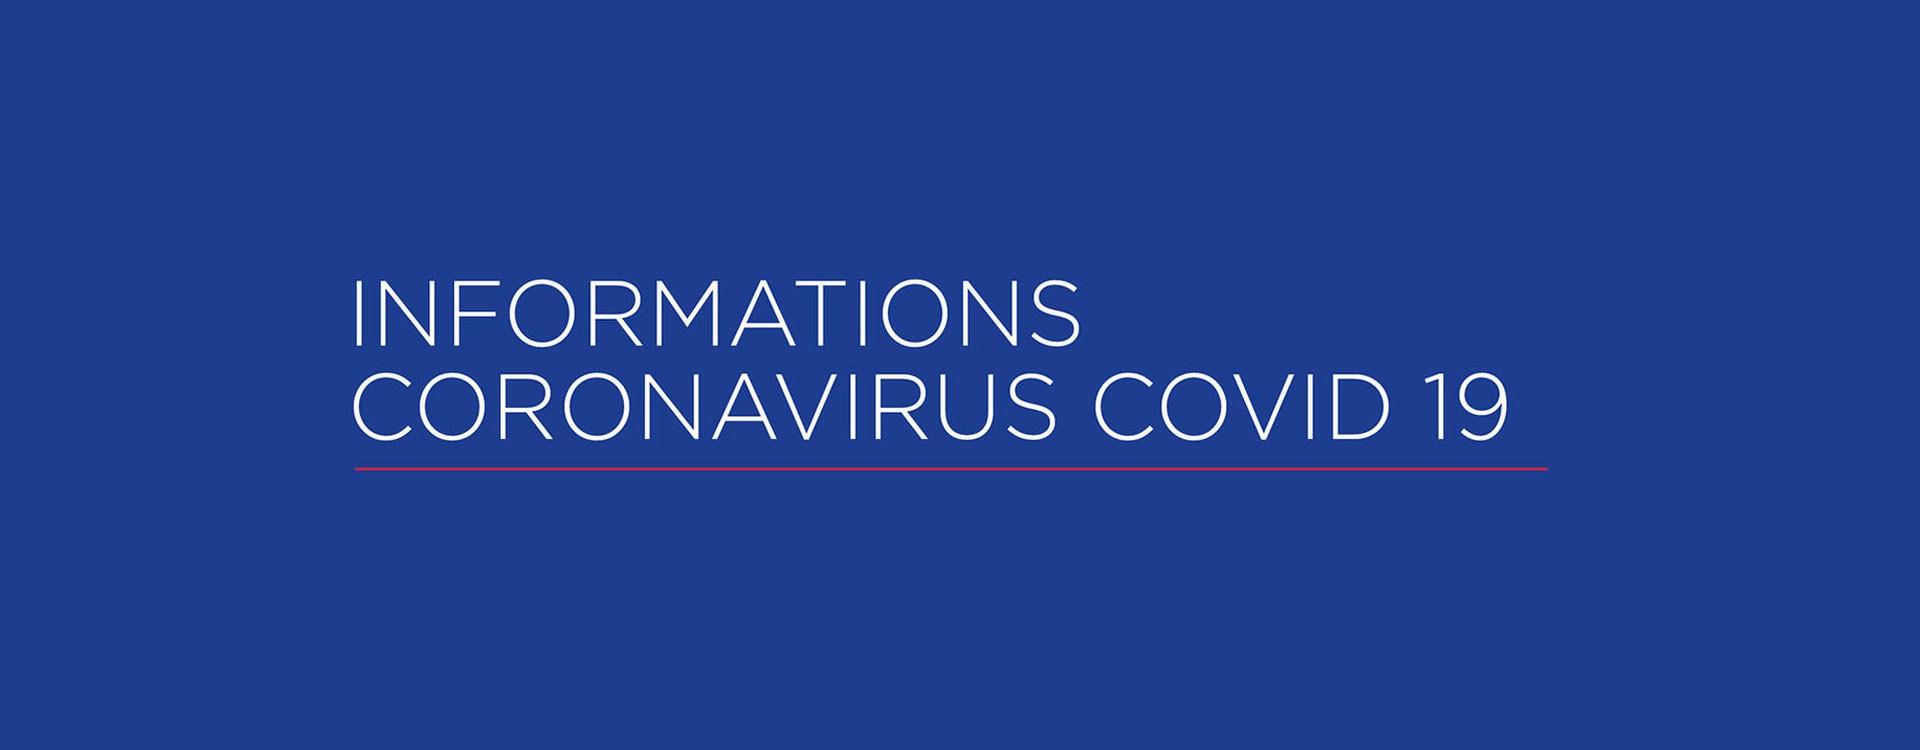 Dispositions face au Coronavirus (COVID-19)